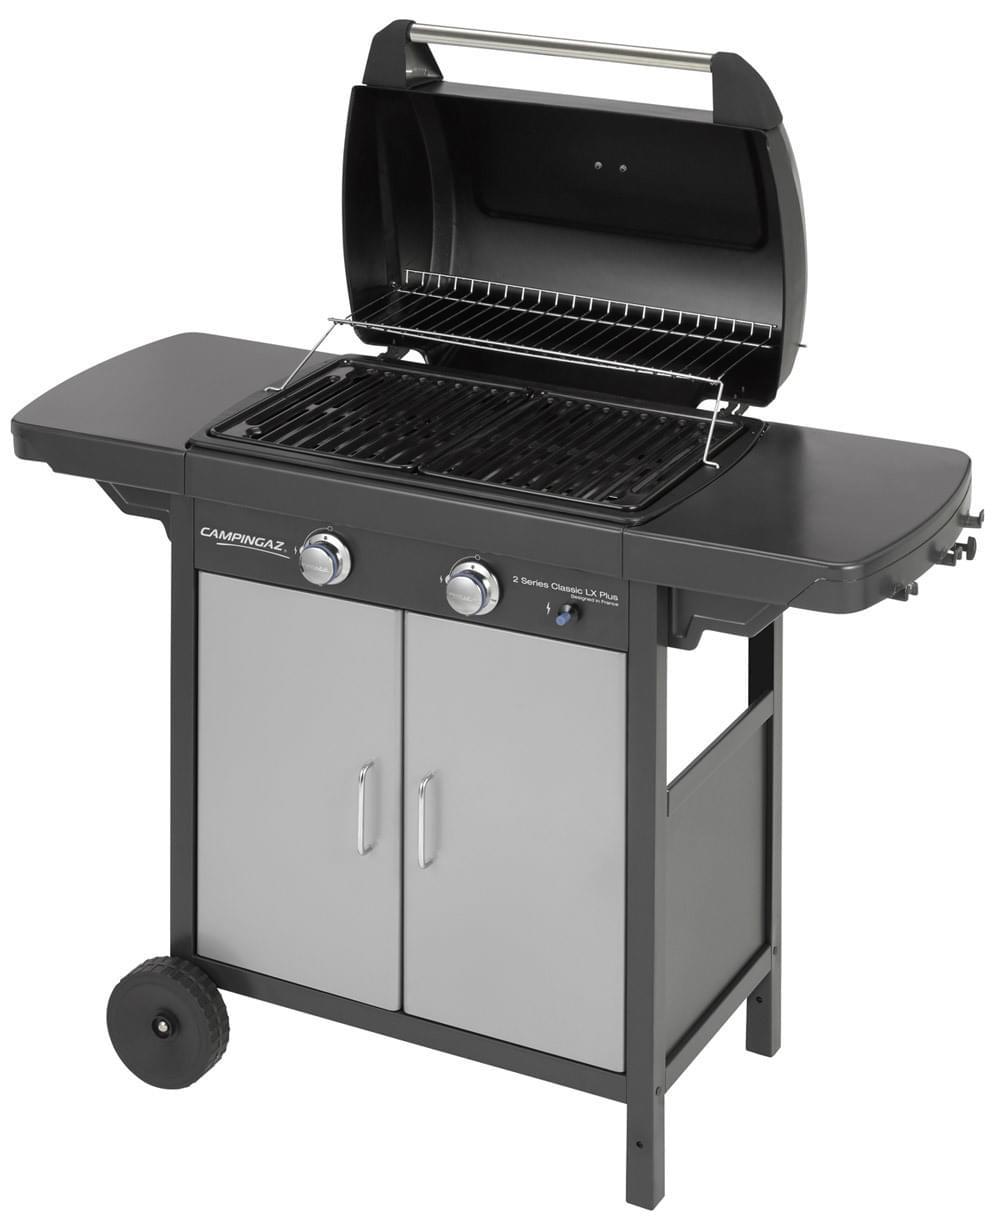 Campingaz 2 Series Classic LX Plus Gasbarbecue